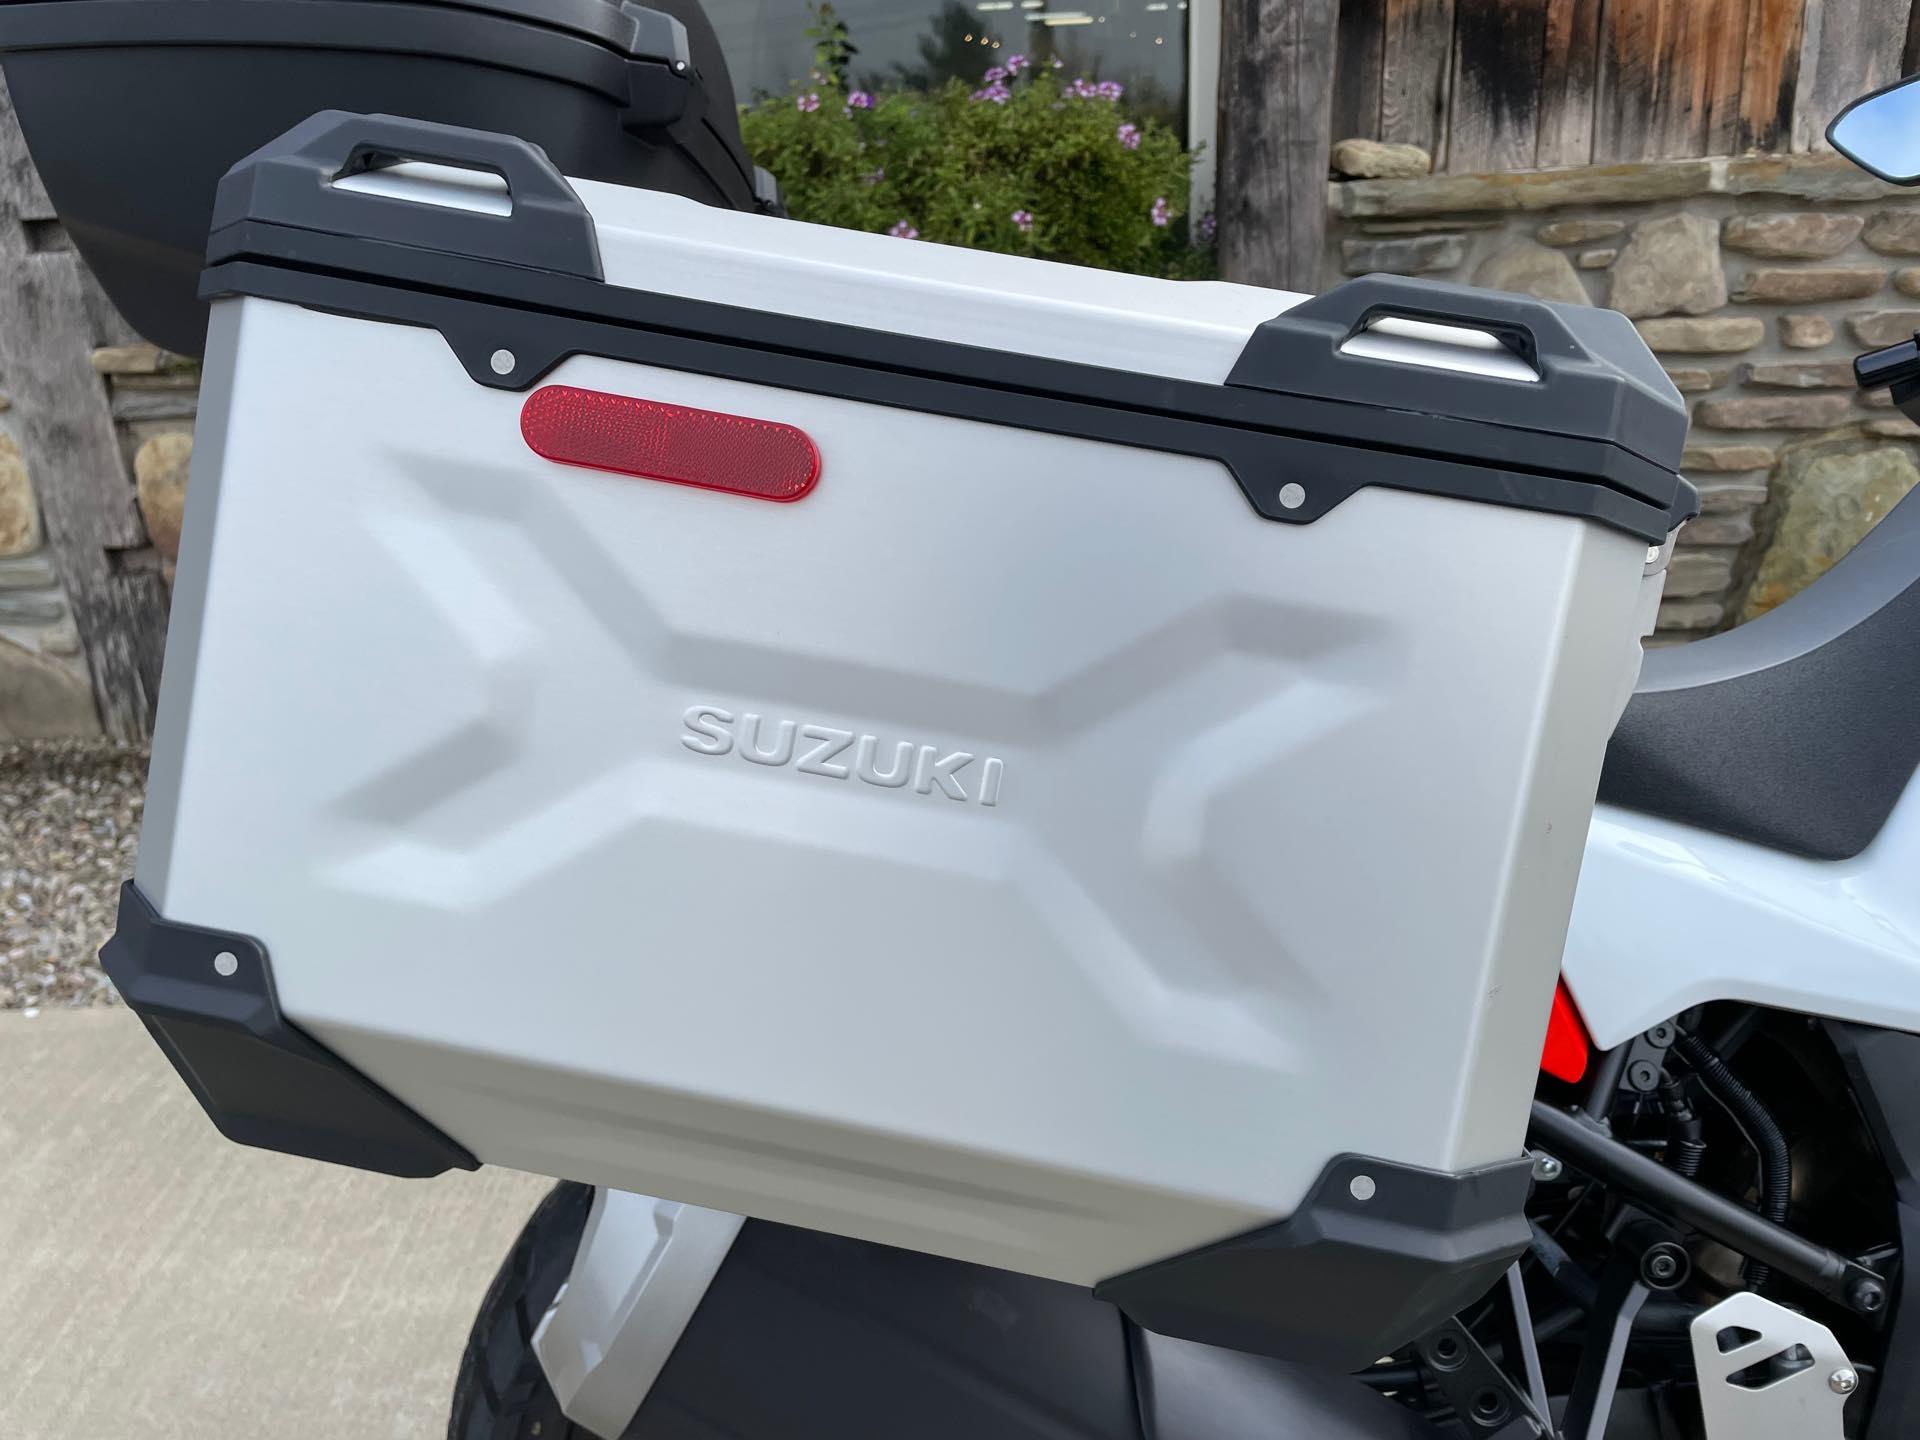 2020 Suzuki V-Strom 1050XT at Arkport Cycles